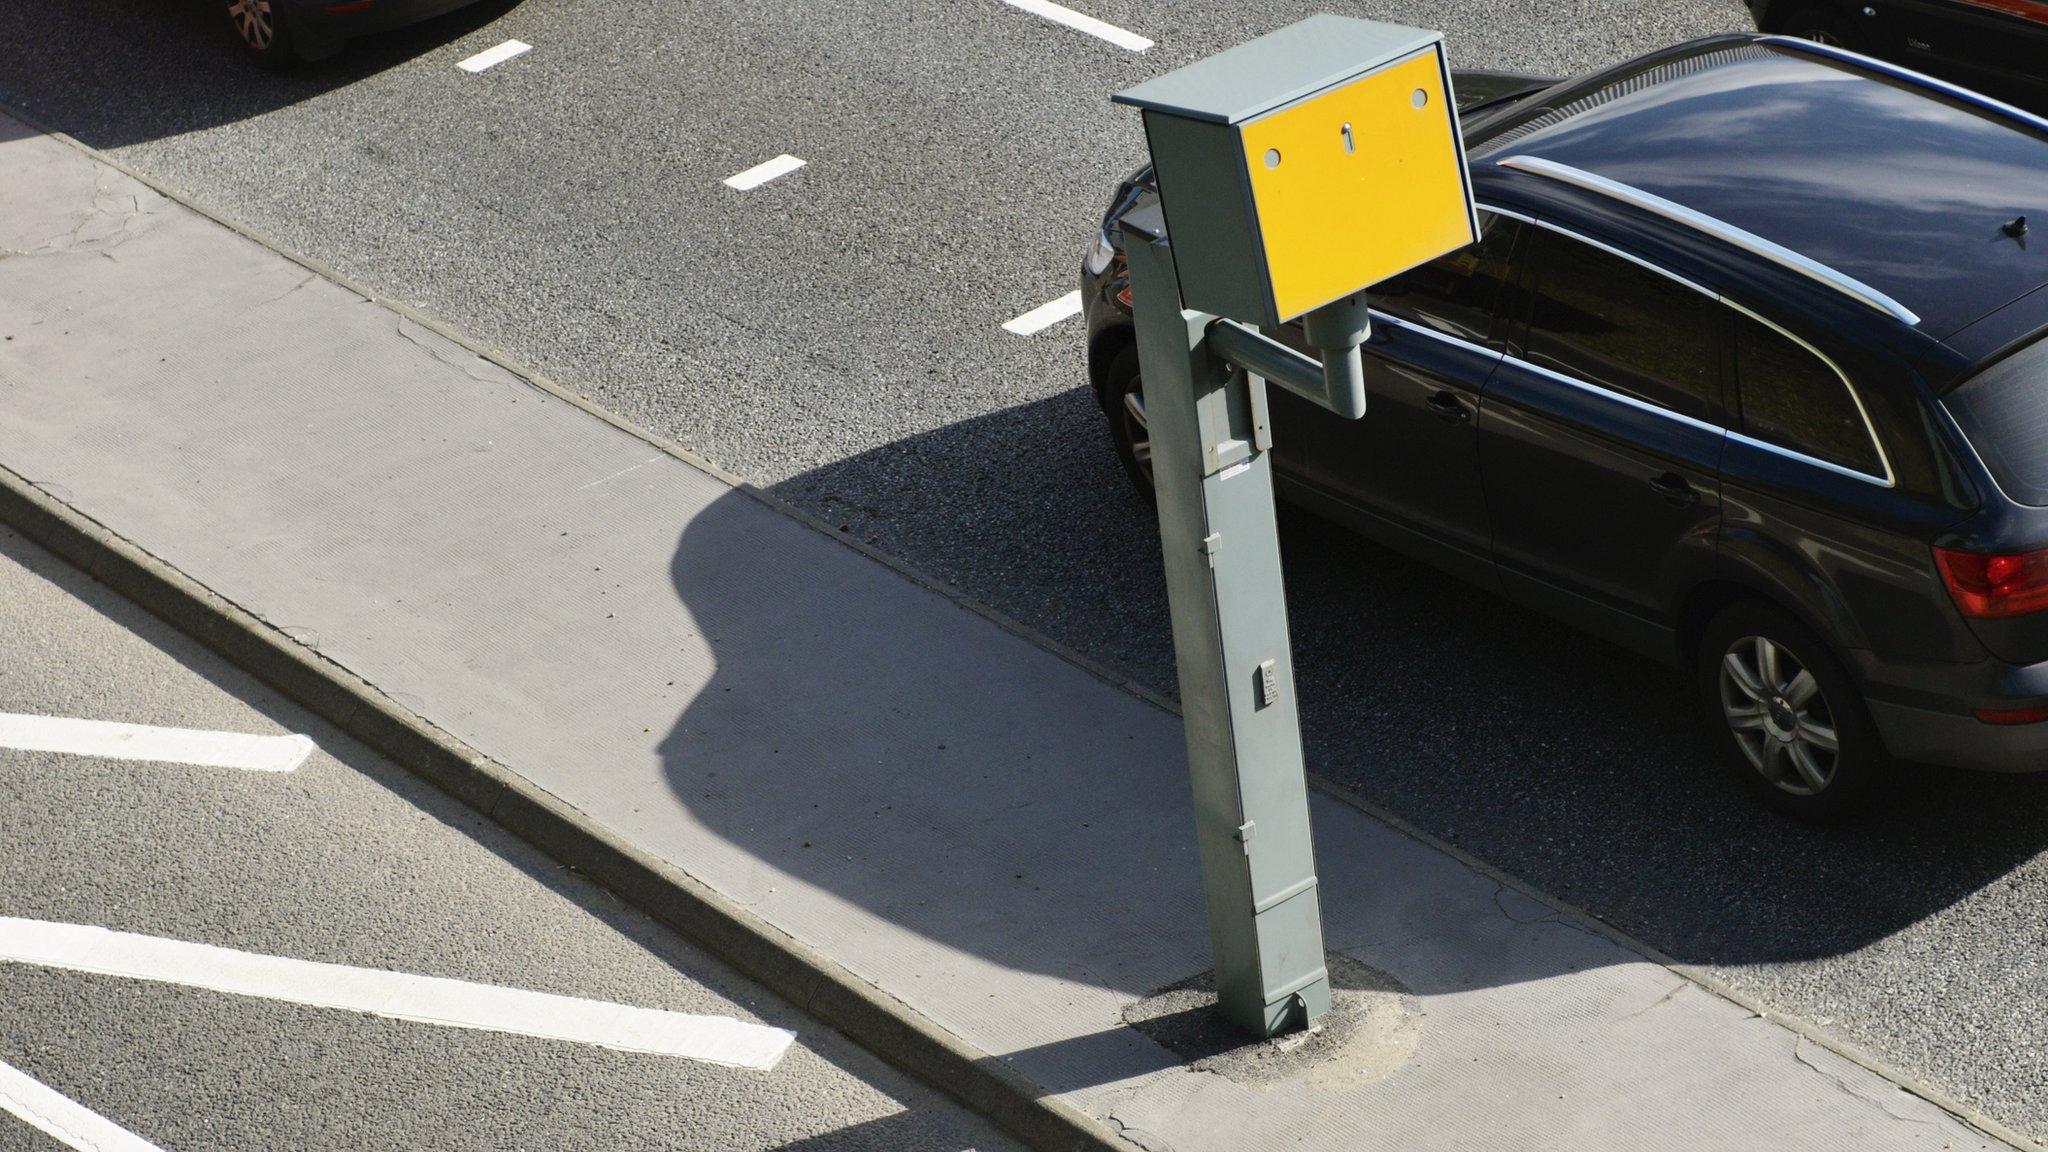 Eight-year-olds caught speeding, DVLA data shows